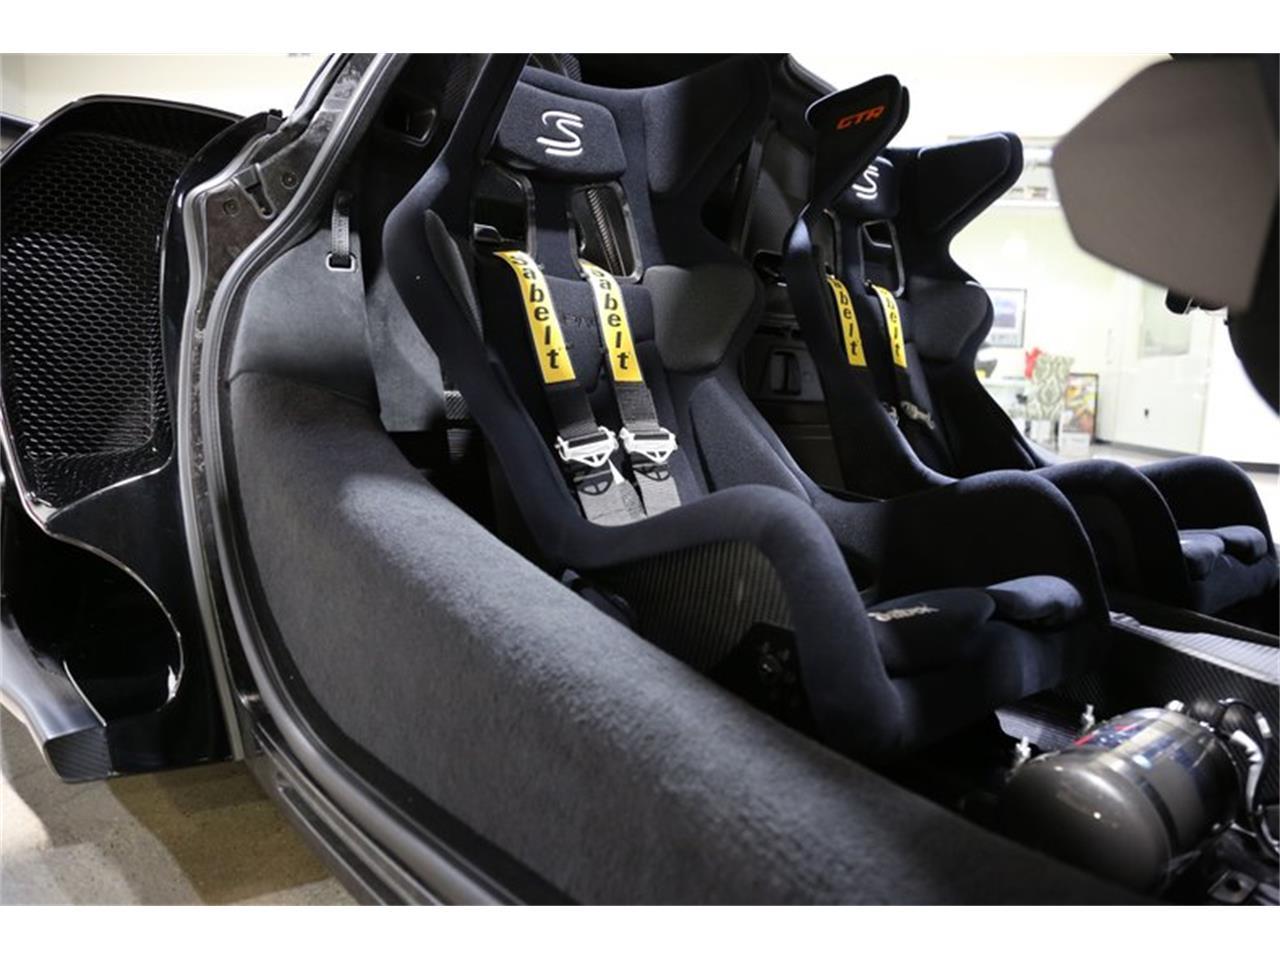 2020 McLaren Senna (CC-1363921) for sale in Chatsworth, California